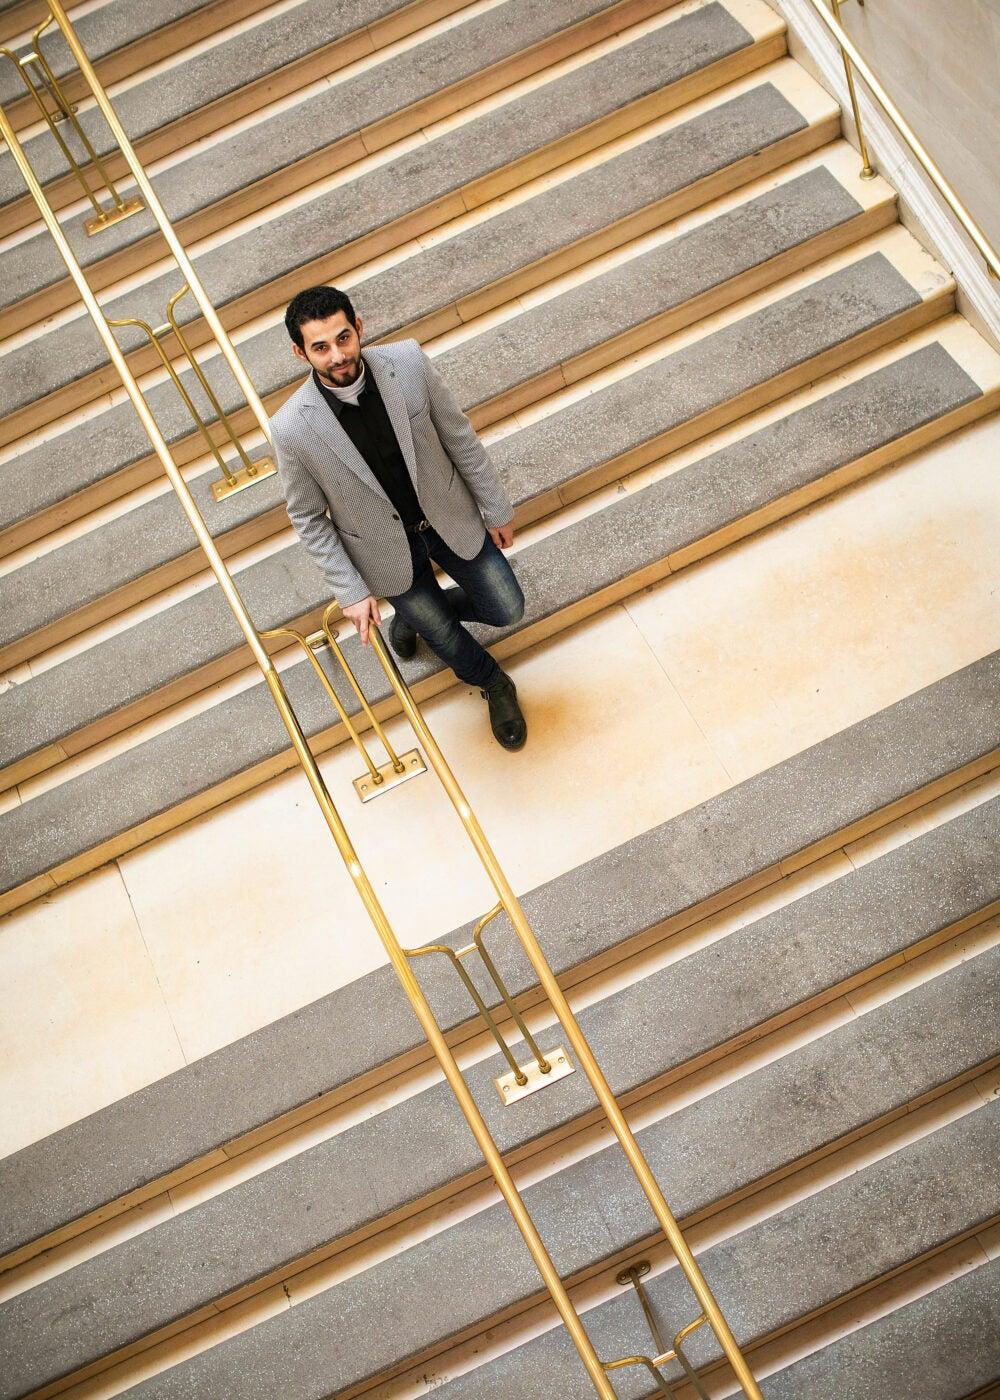 Mosab Abu Toha walking down the stairs.